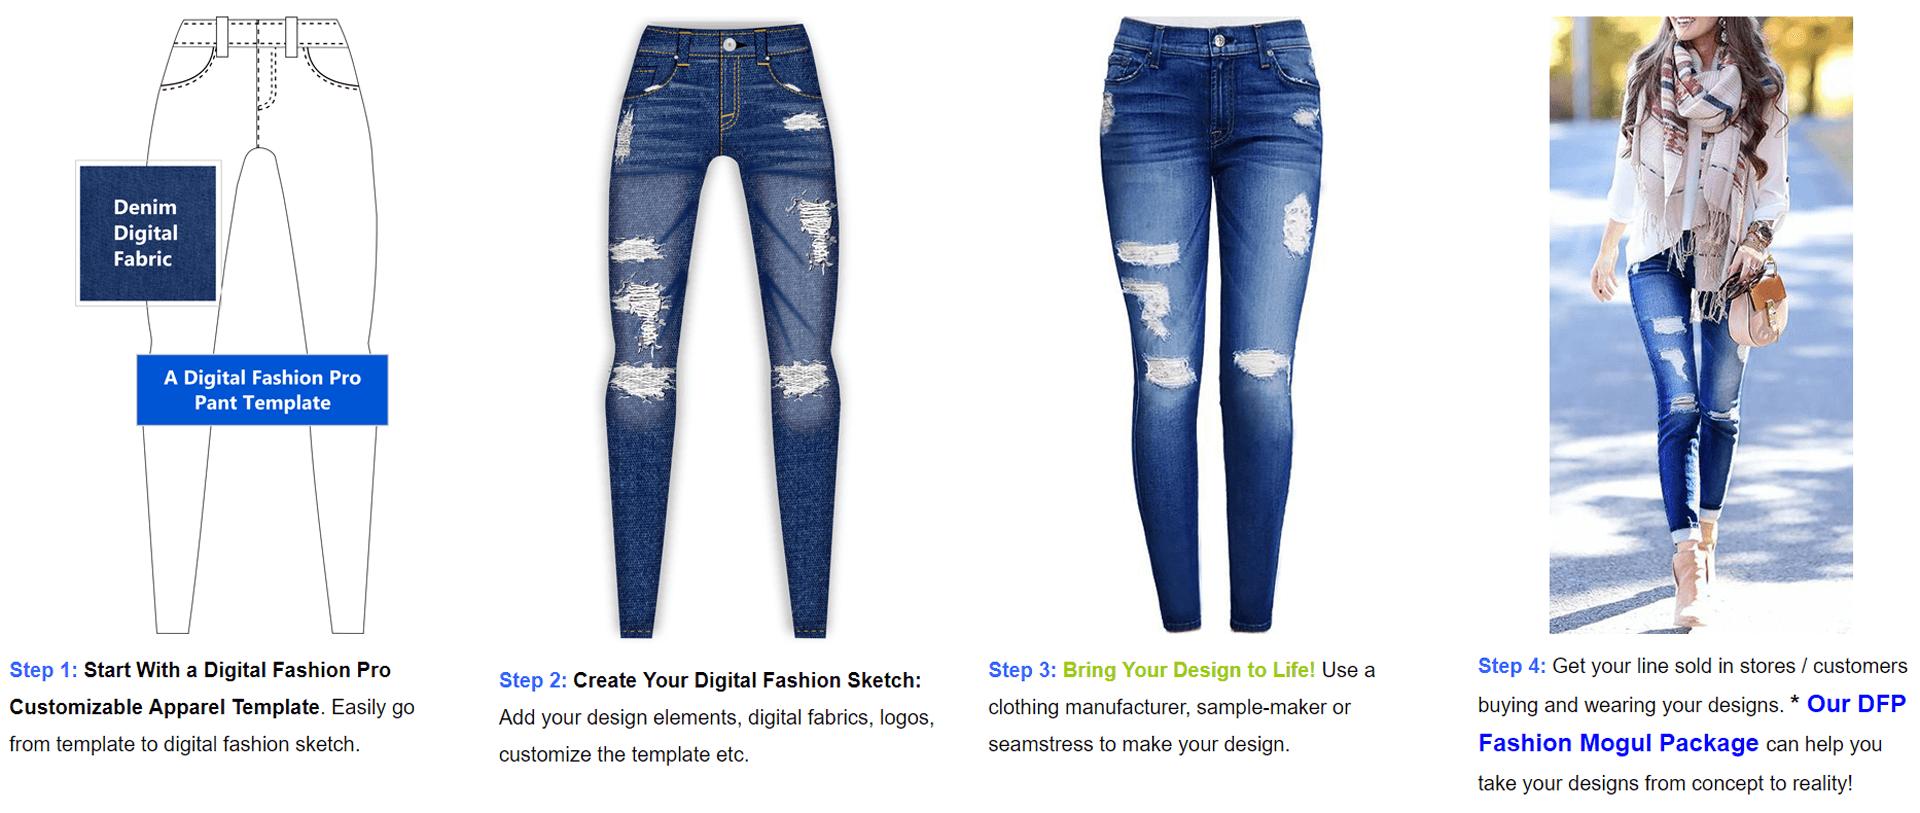 1713b499cab Clothing Design Software - Fashion Illustration Program - by - Digital  Fashion Pro